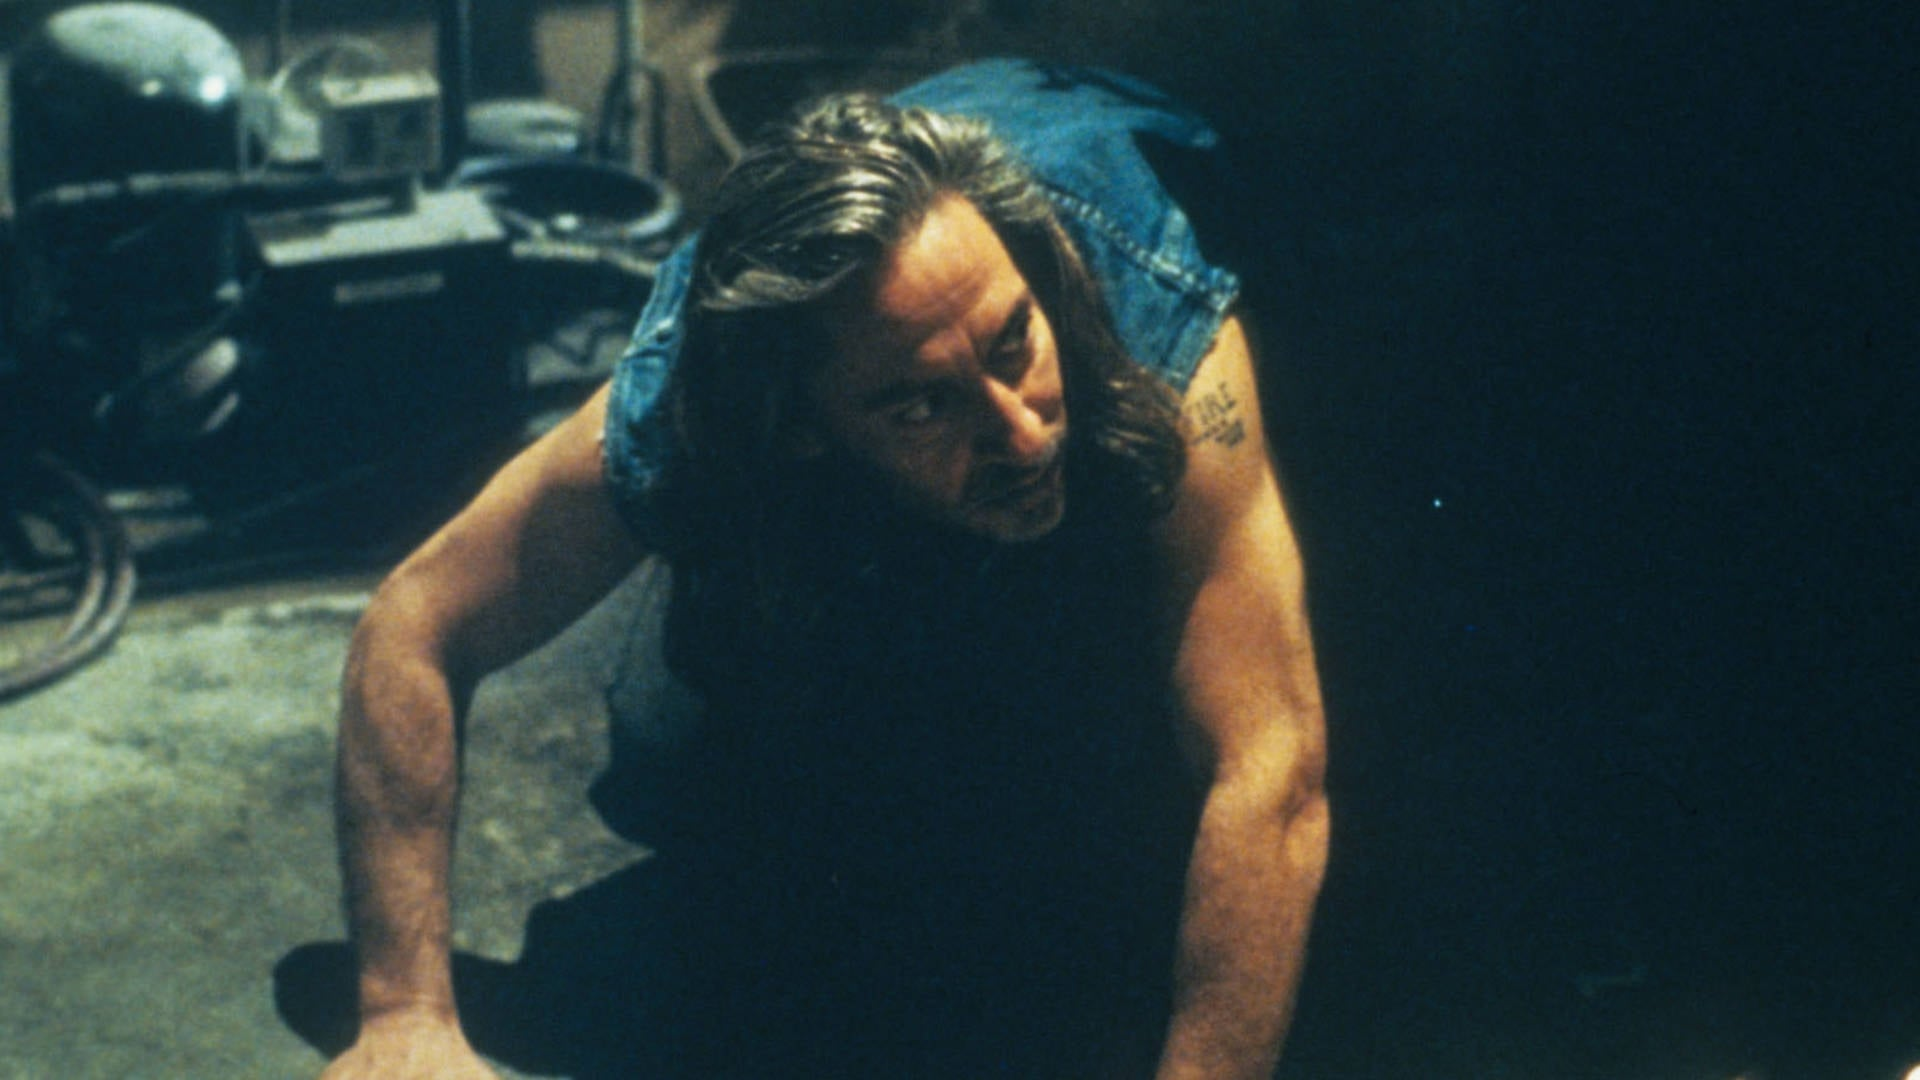 Twin Peaks - Season 1 Episode 3 : Zen, Or The Skill To Catch A Killer